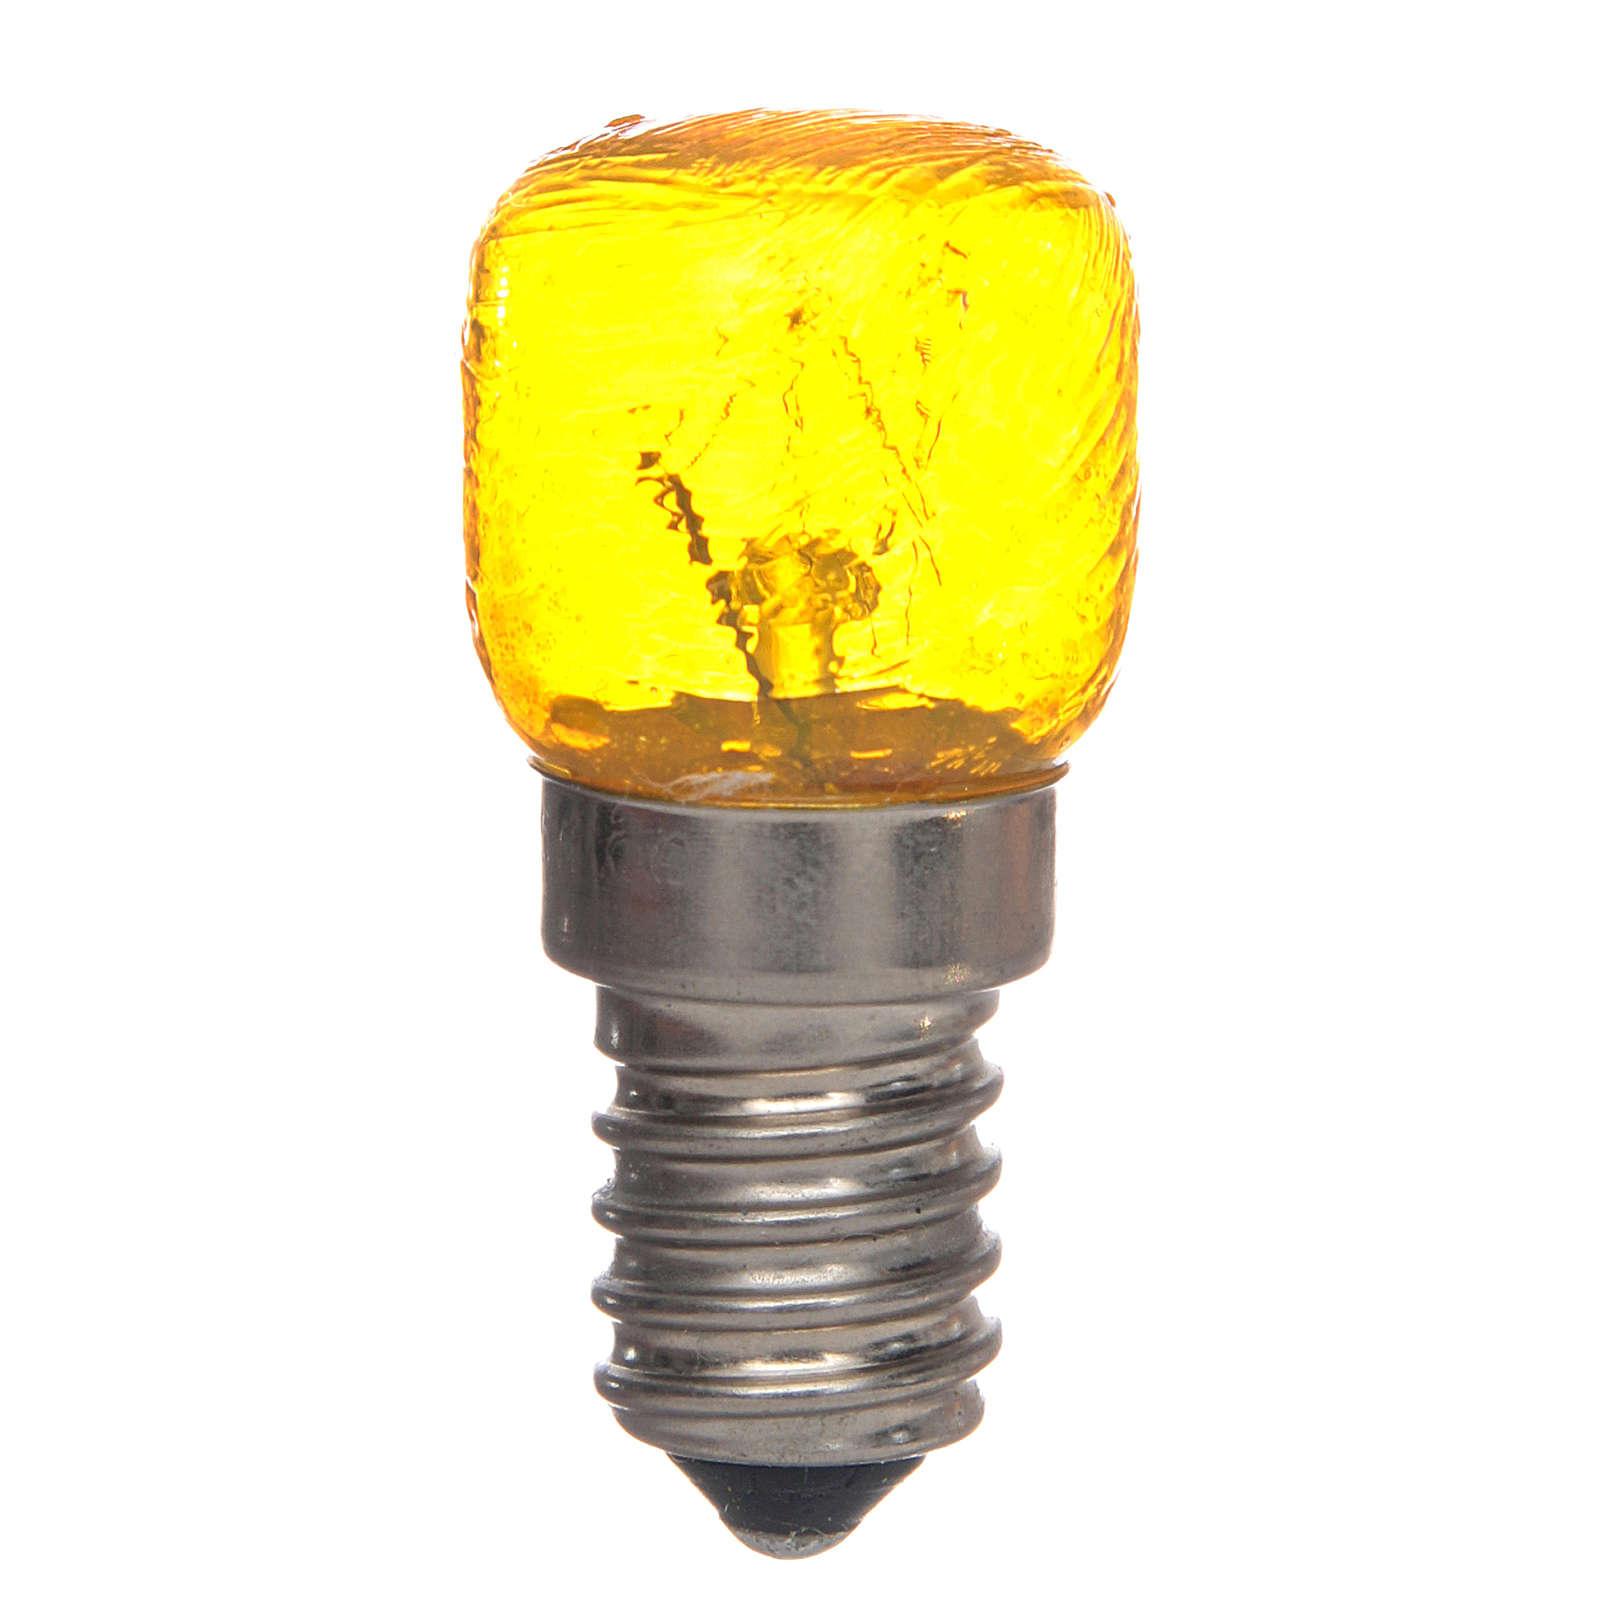 Żarówka E14 żółty 15W 220V 4